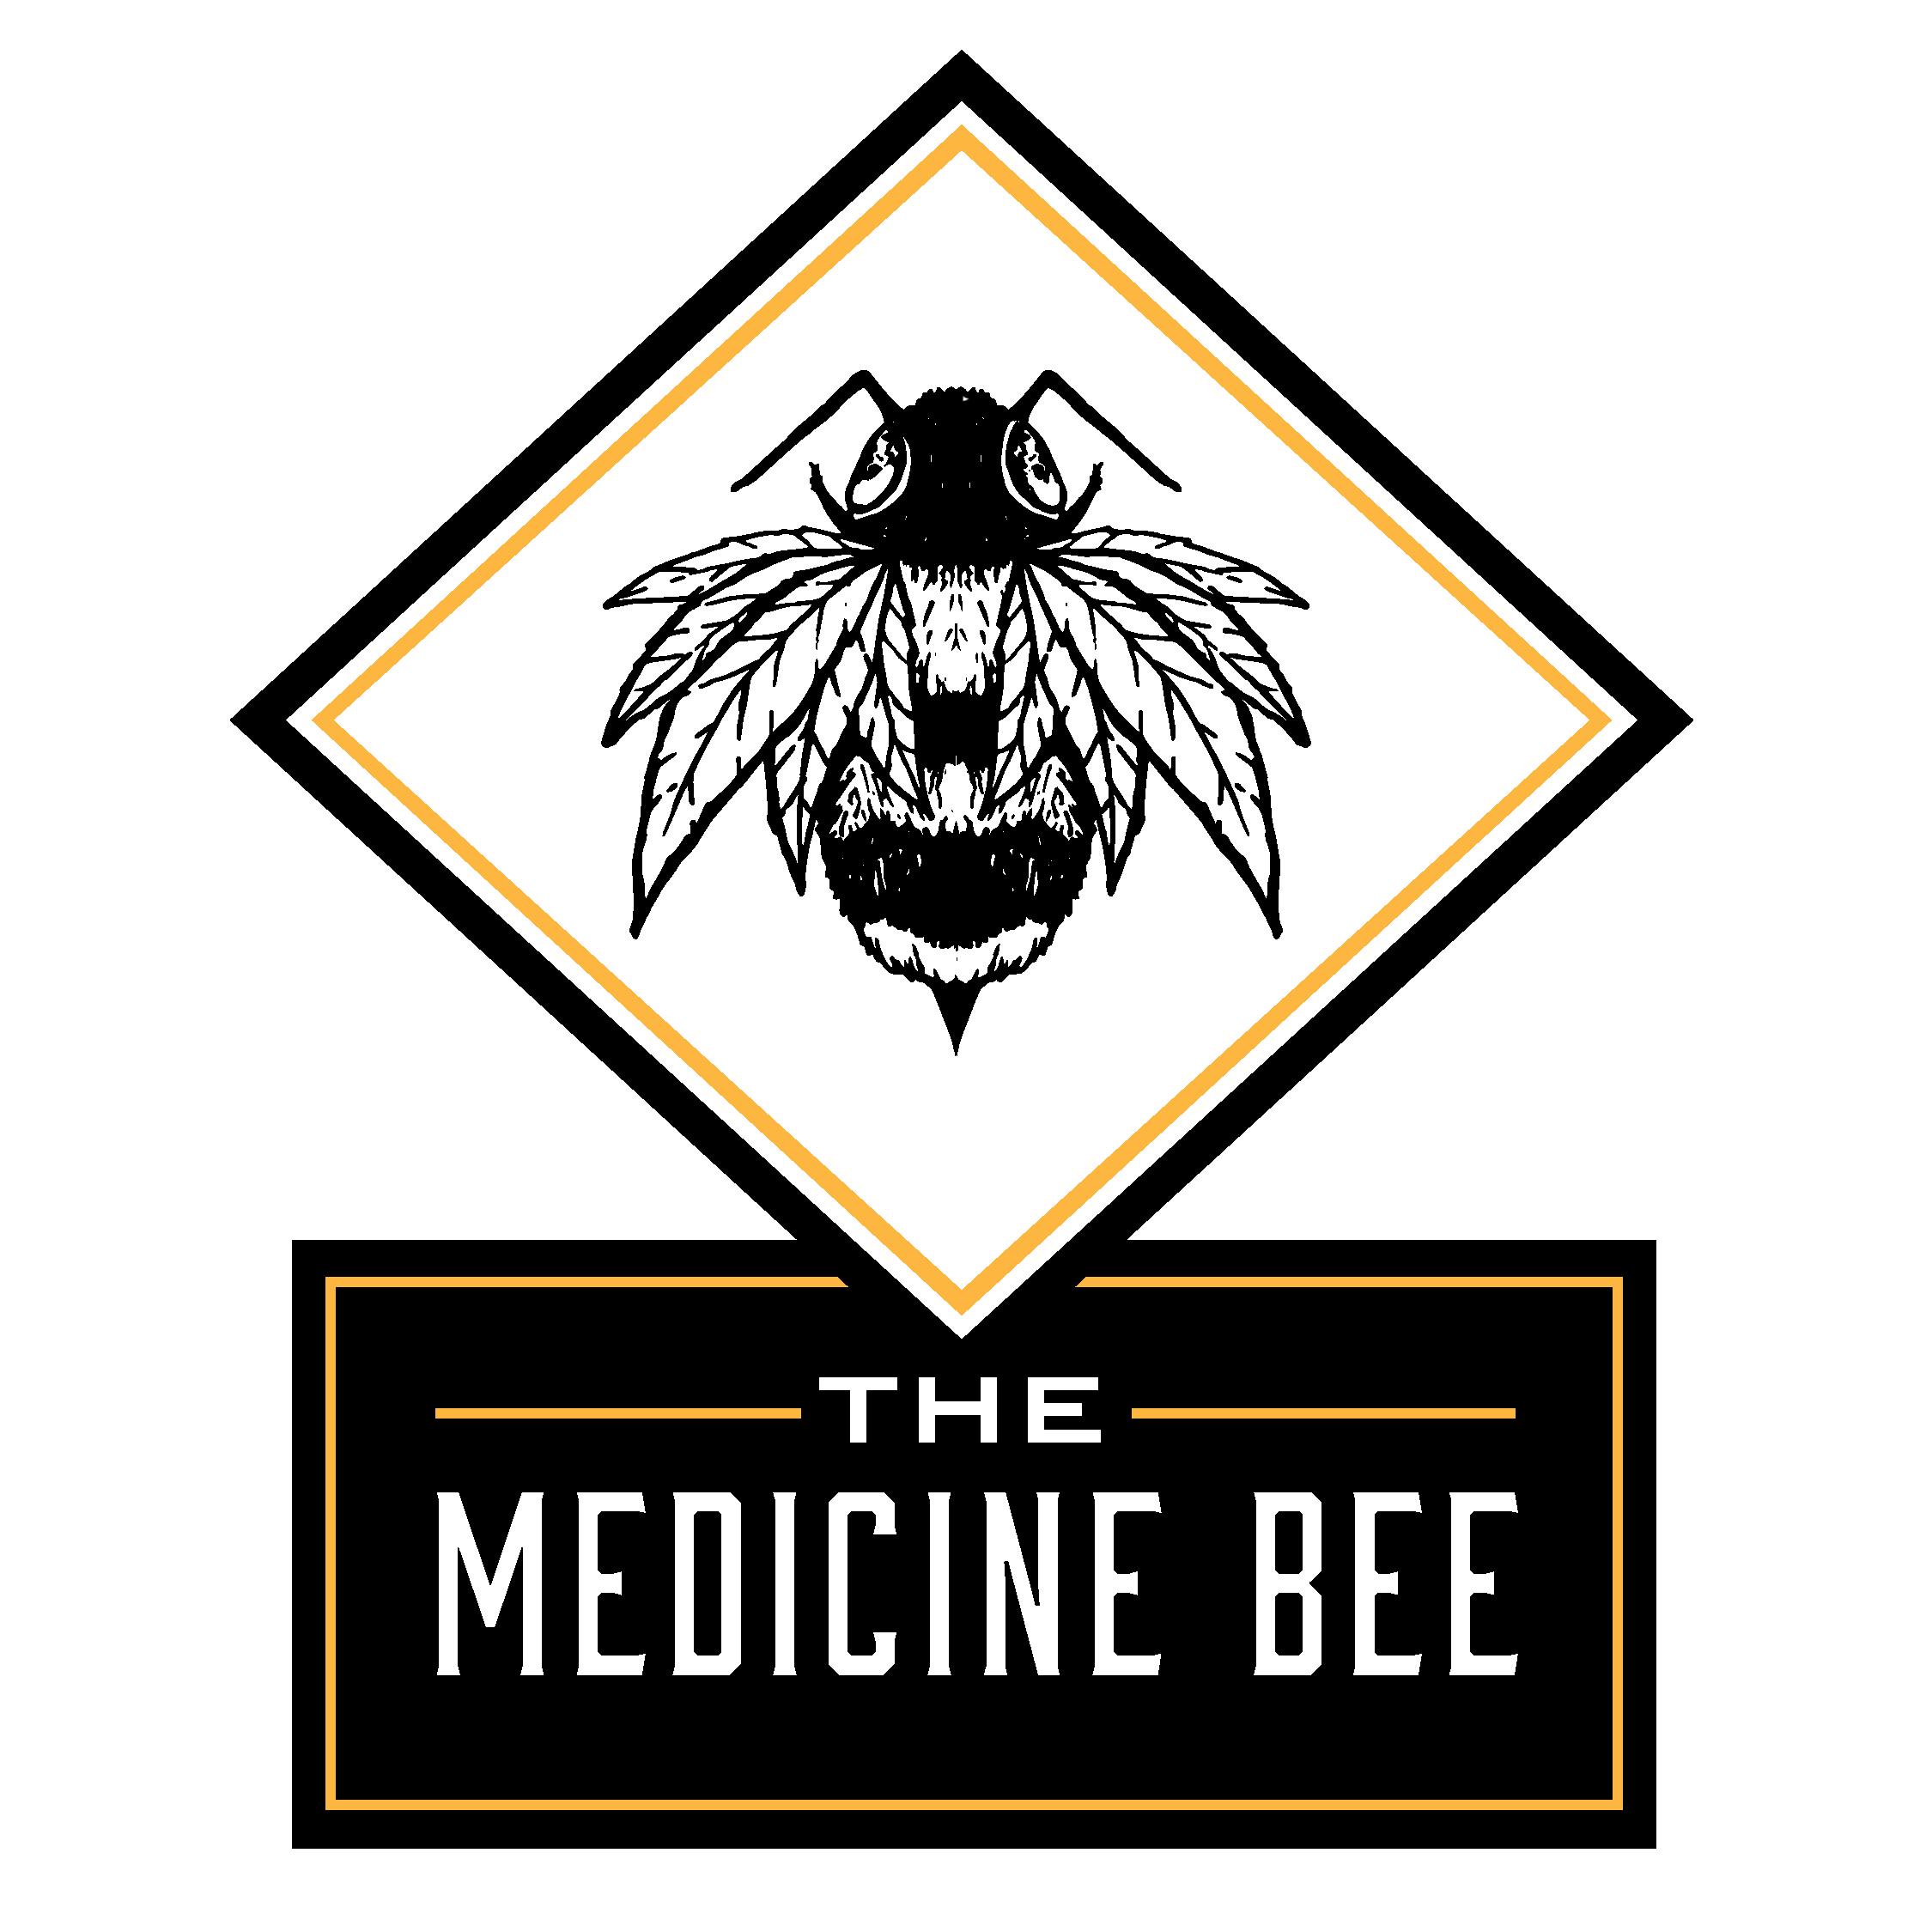 Medicine_bee_web.jpg